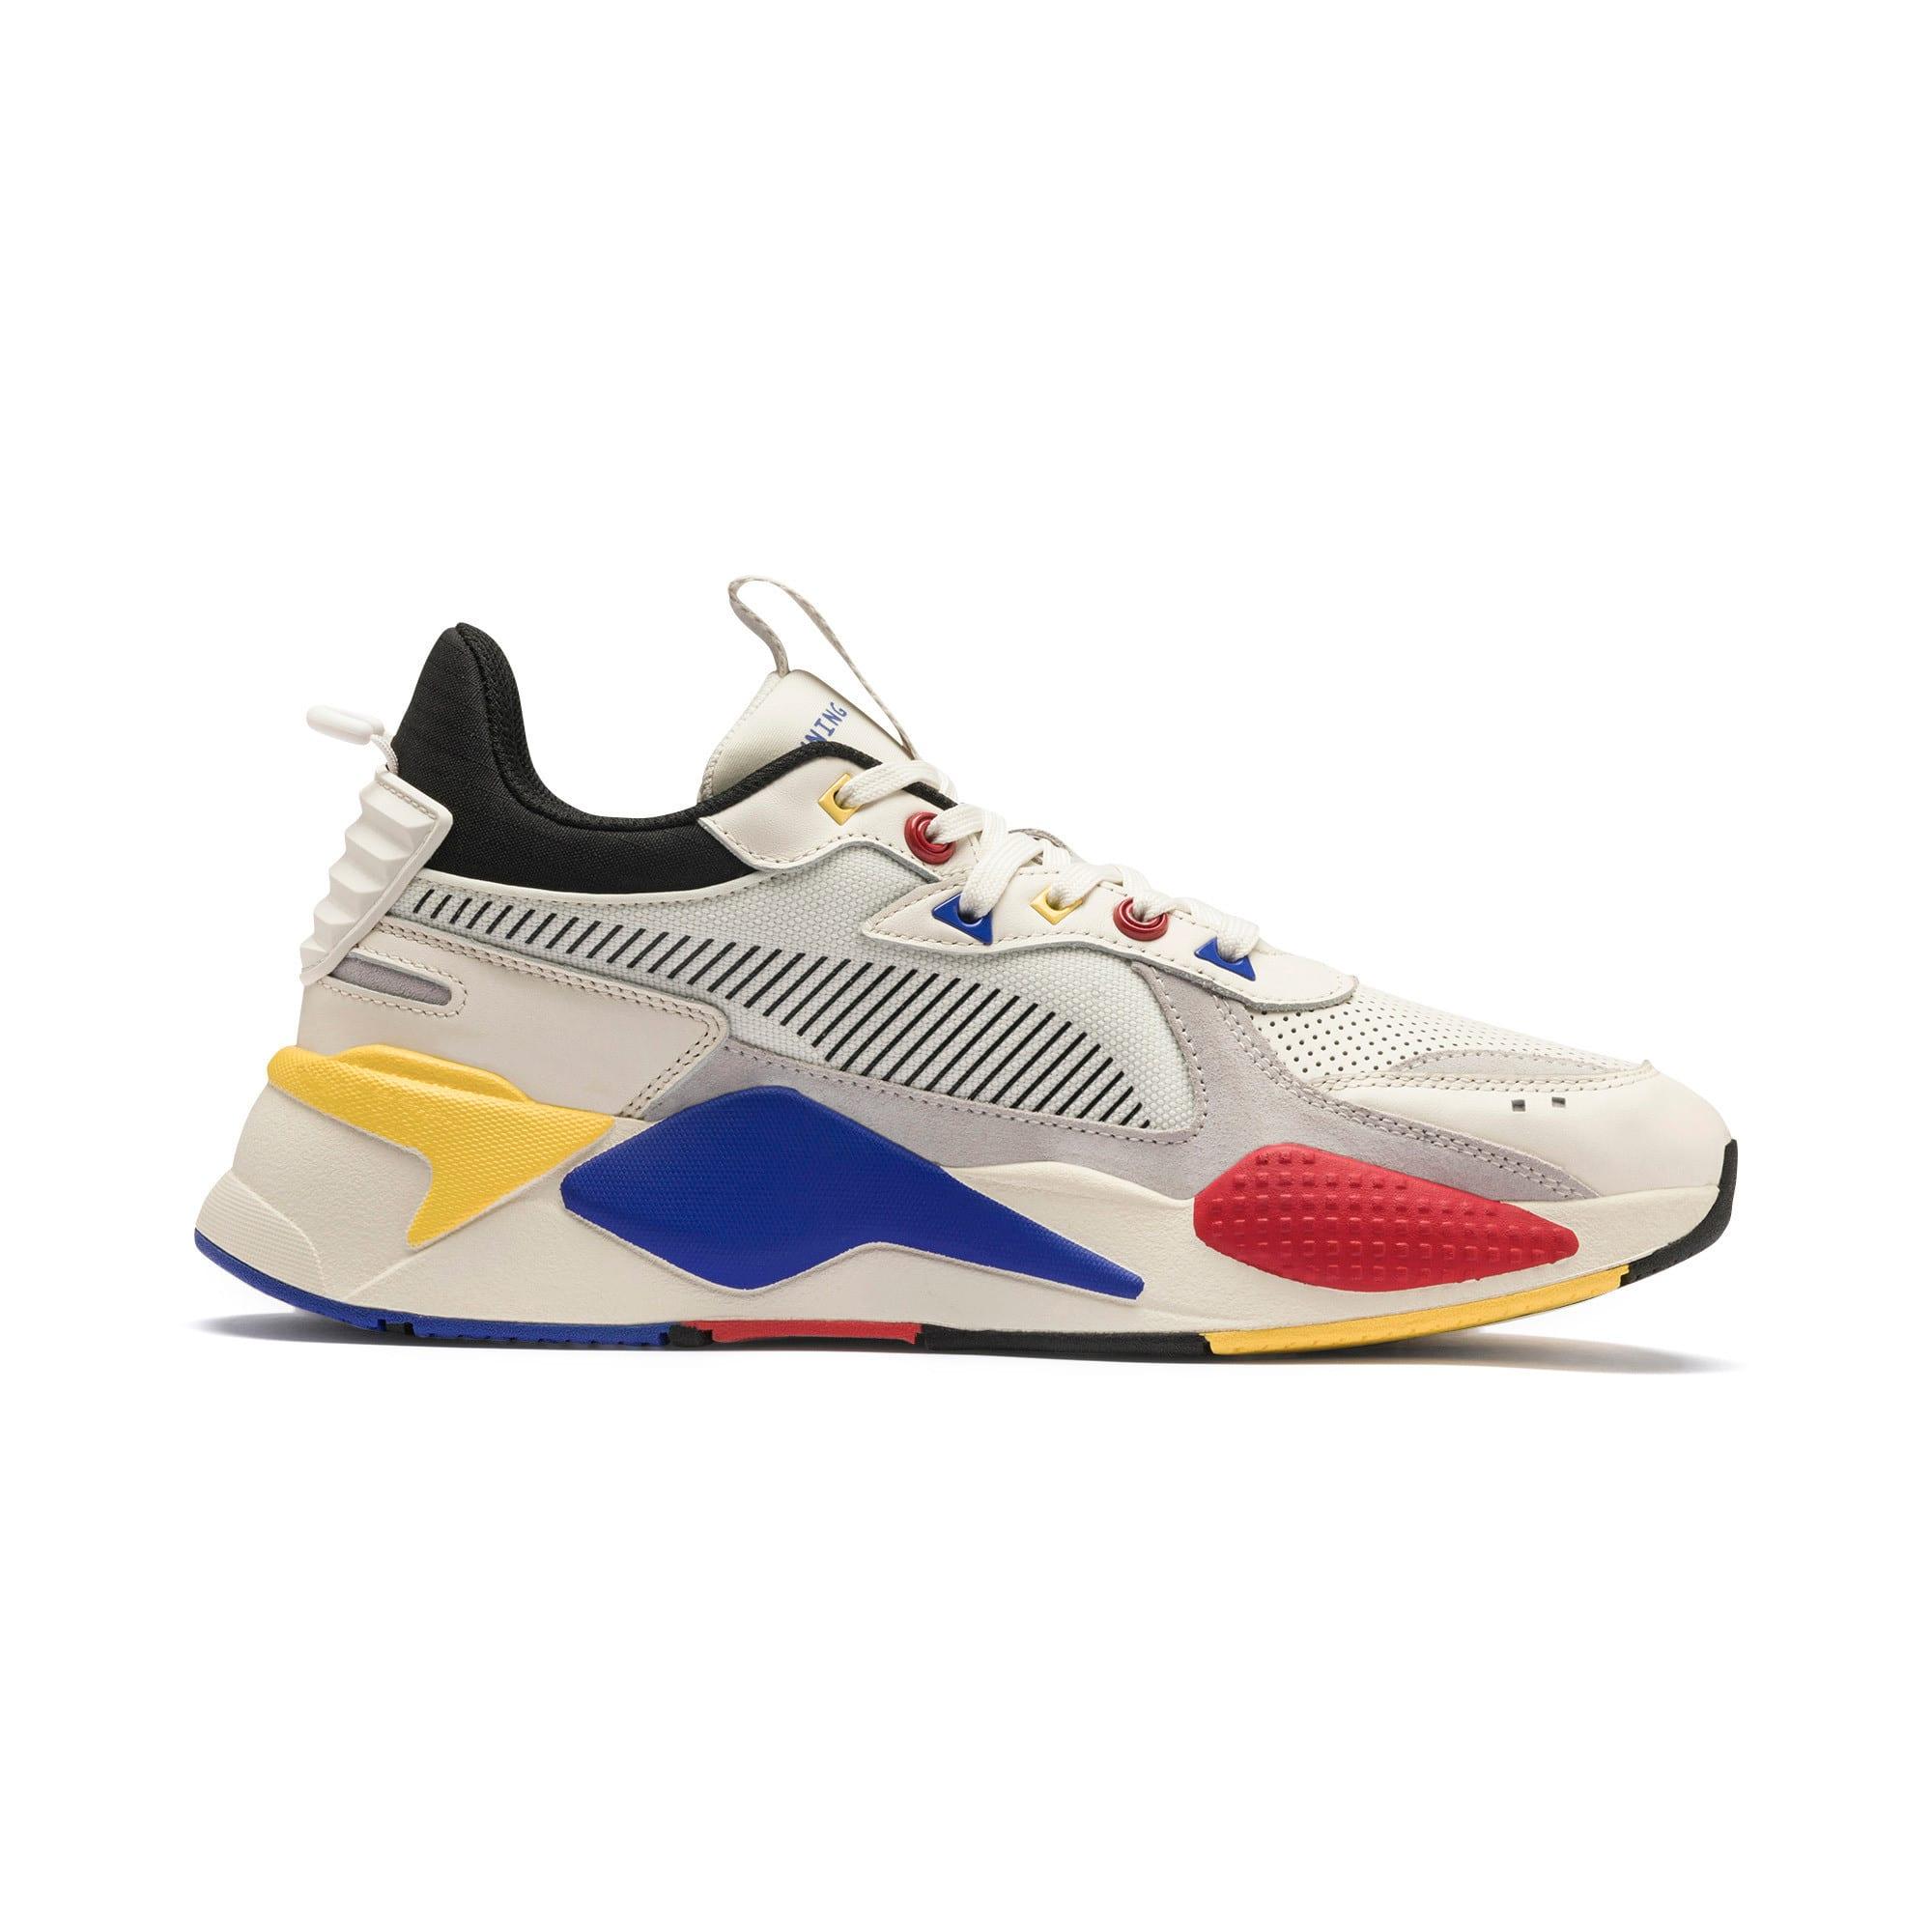 Thumbnail 6 of RS-X Colour Theory Sneaker, Whisper White-Puma Black, medium